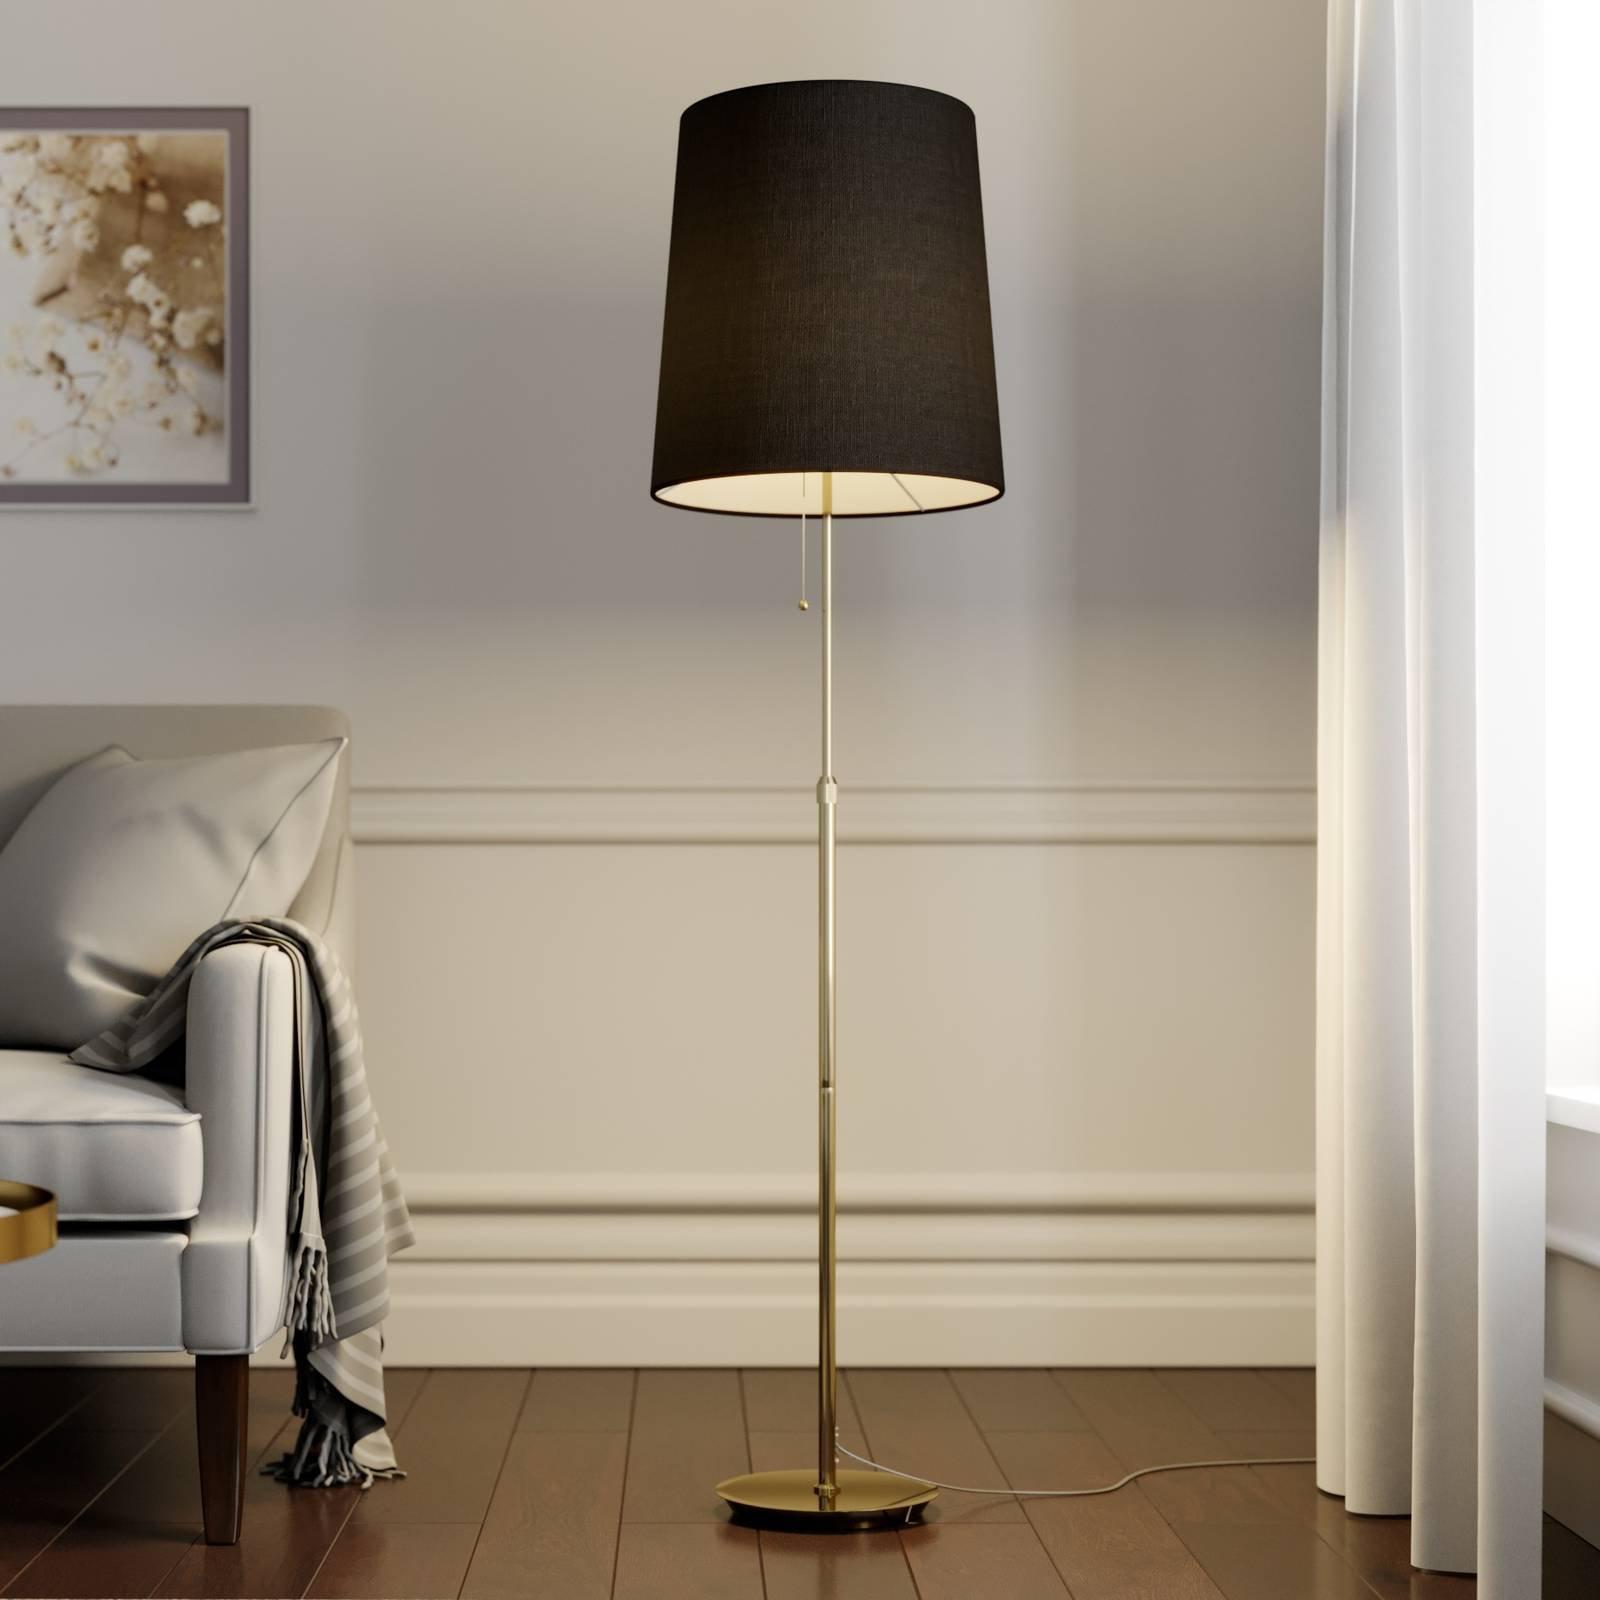 Lucande Pordis gulvlampe, 155 cm, messing-gull